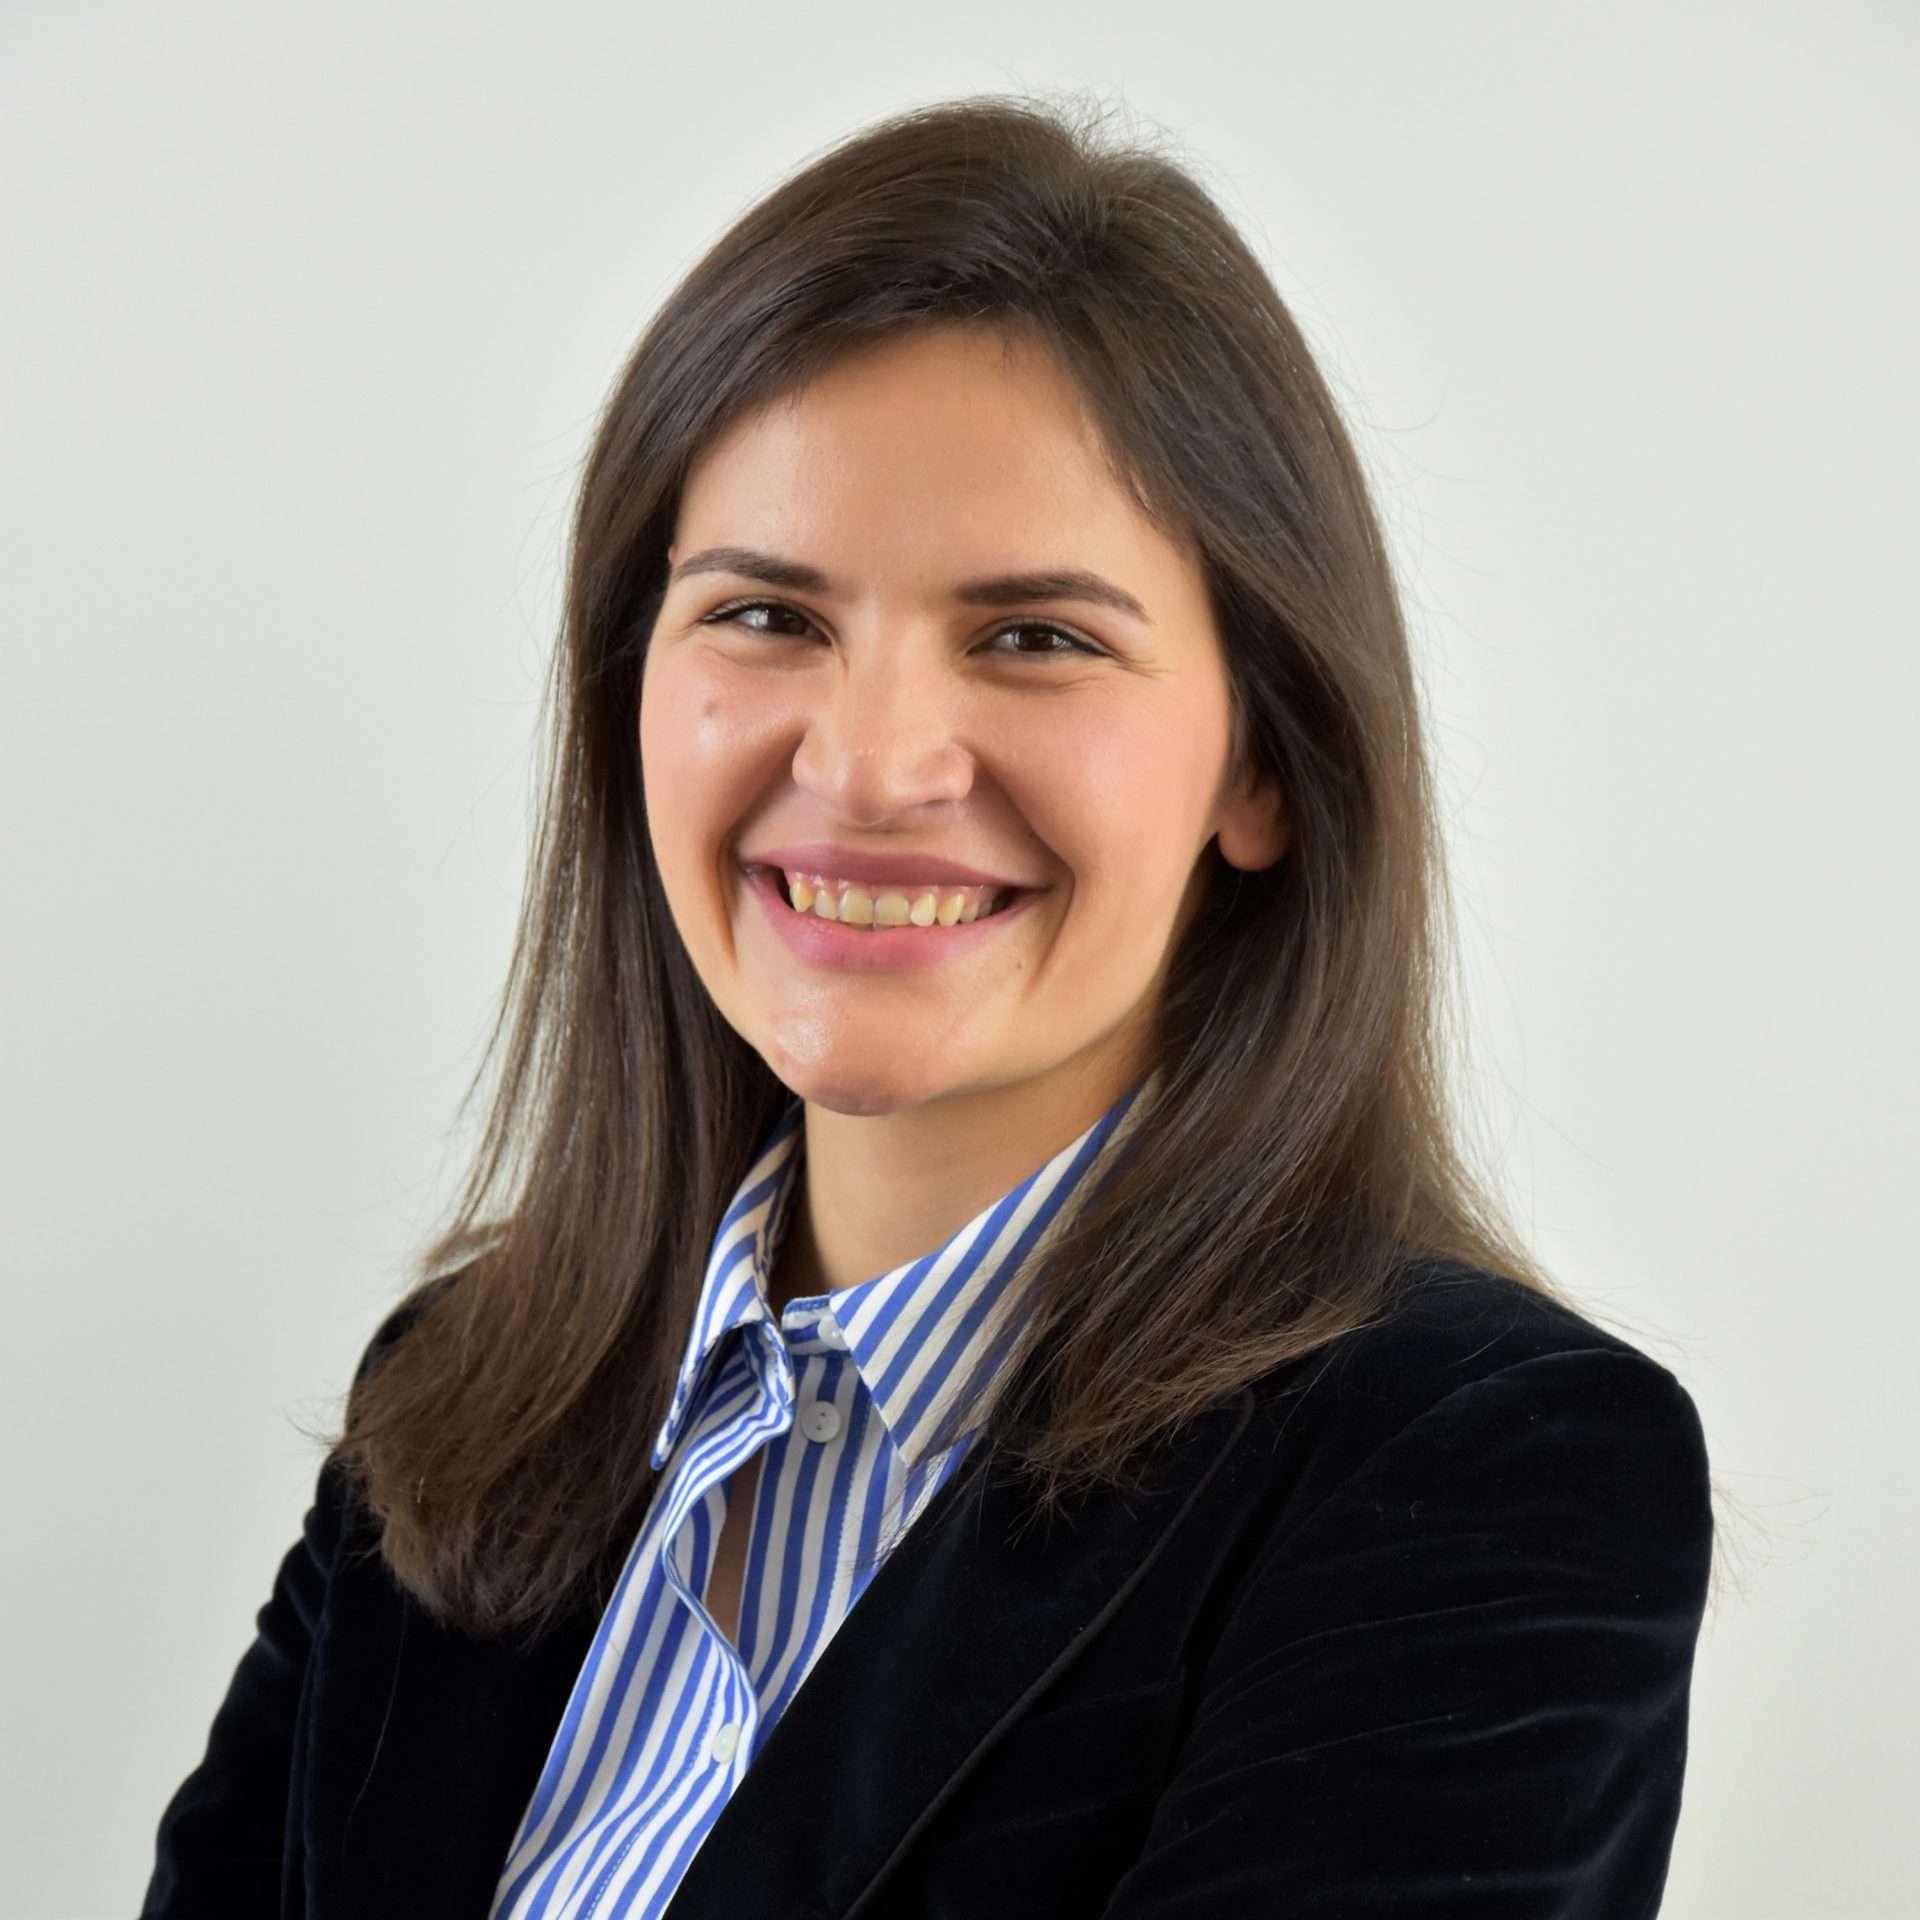 Marina Embracher